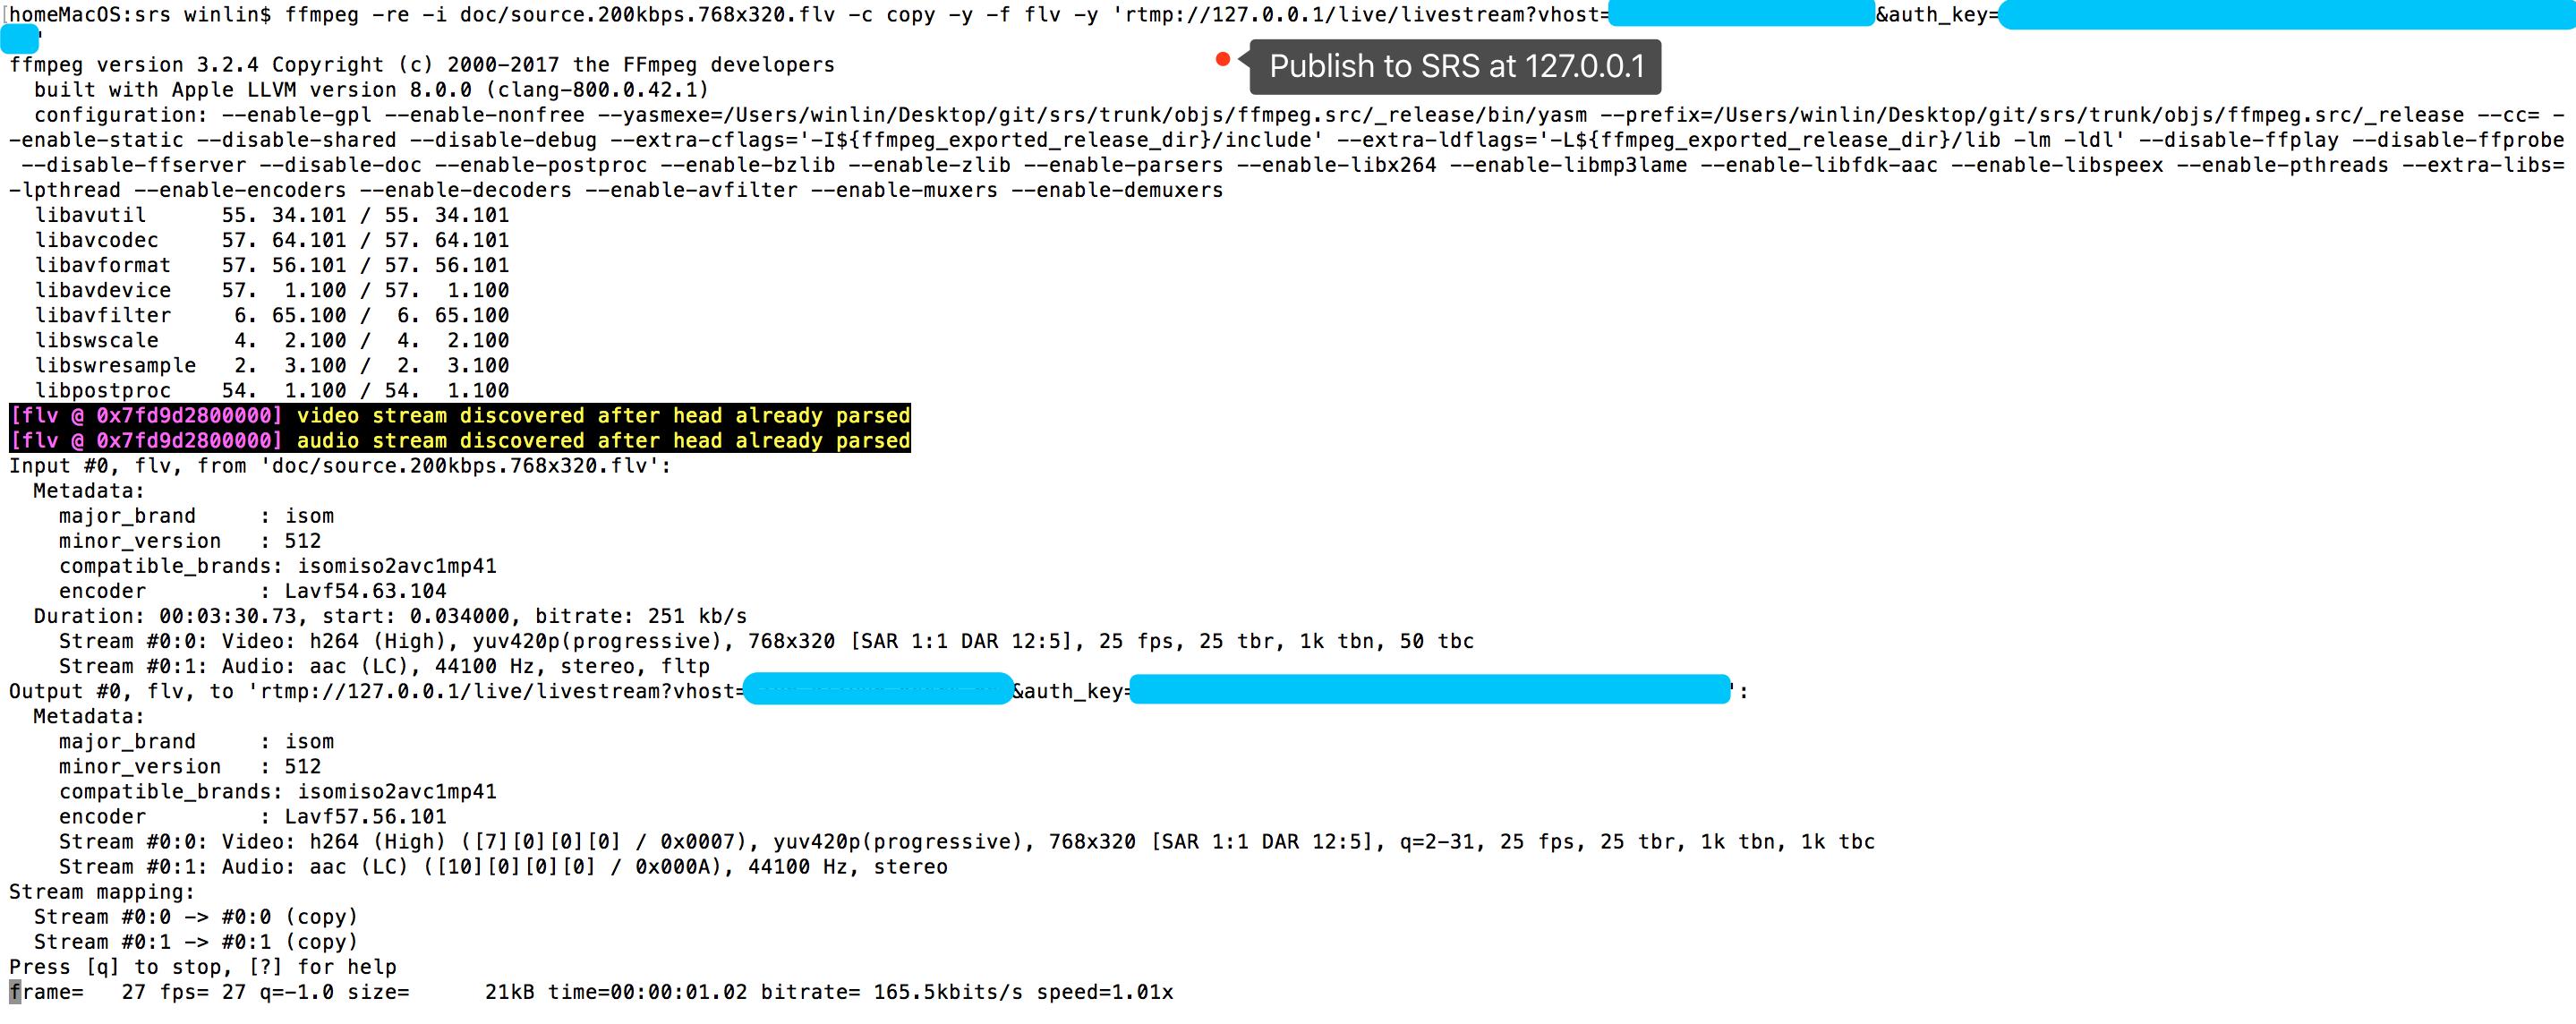 Support edge/forward to Aliyun CDN  支持转发到阿里云CDN